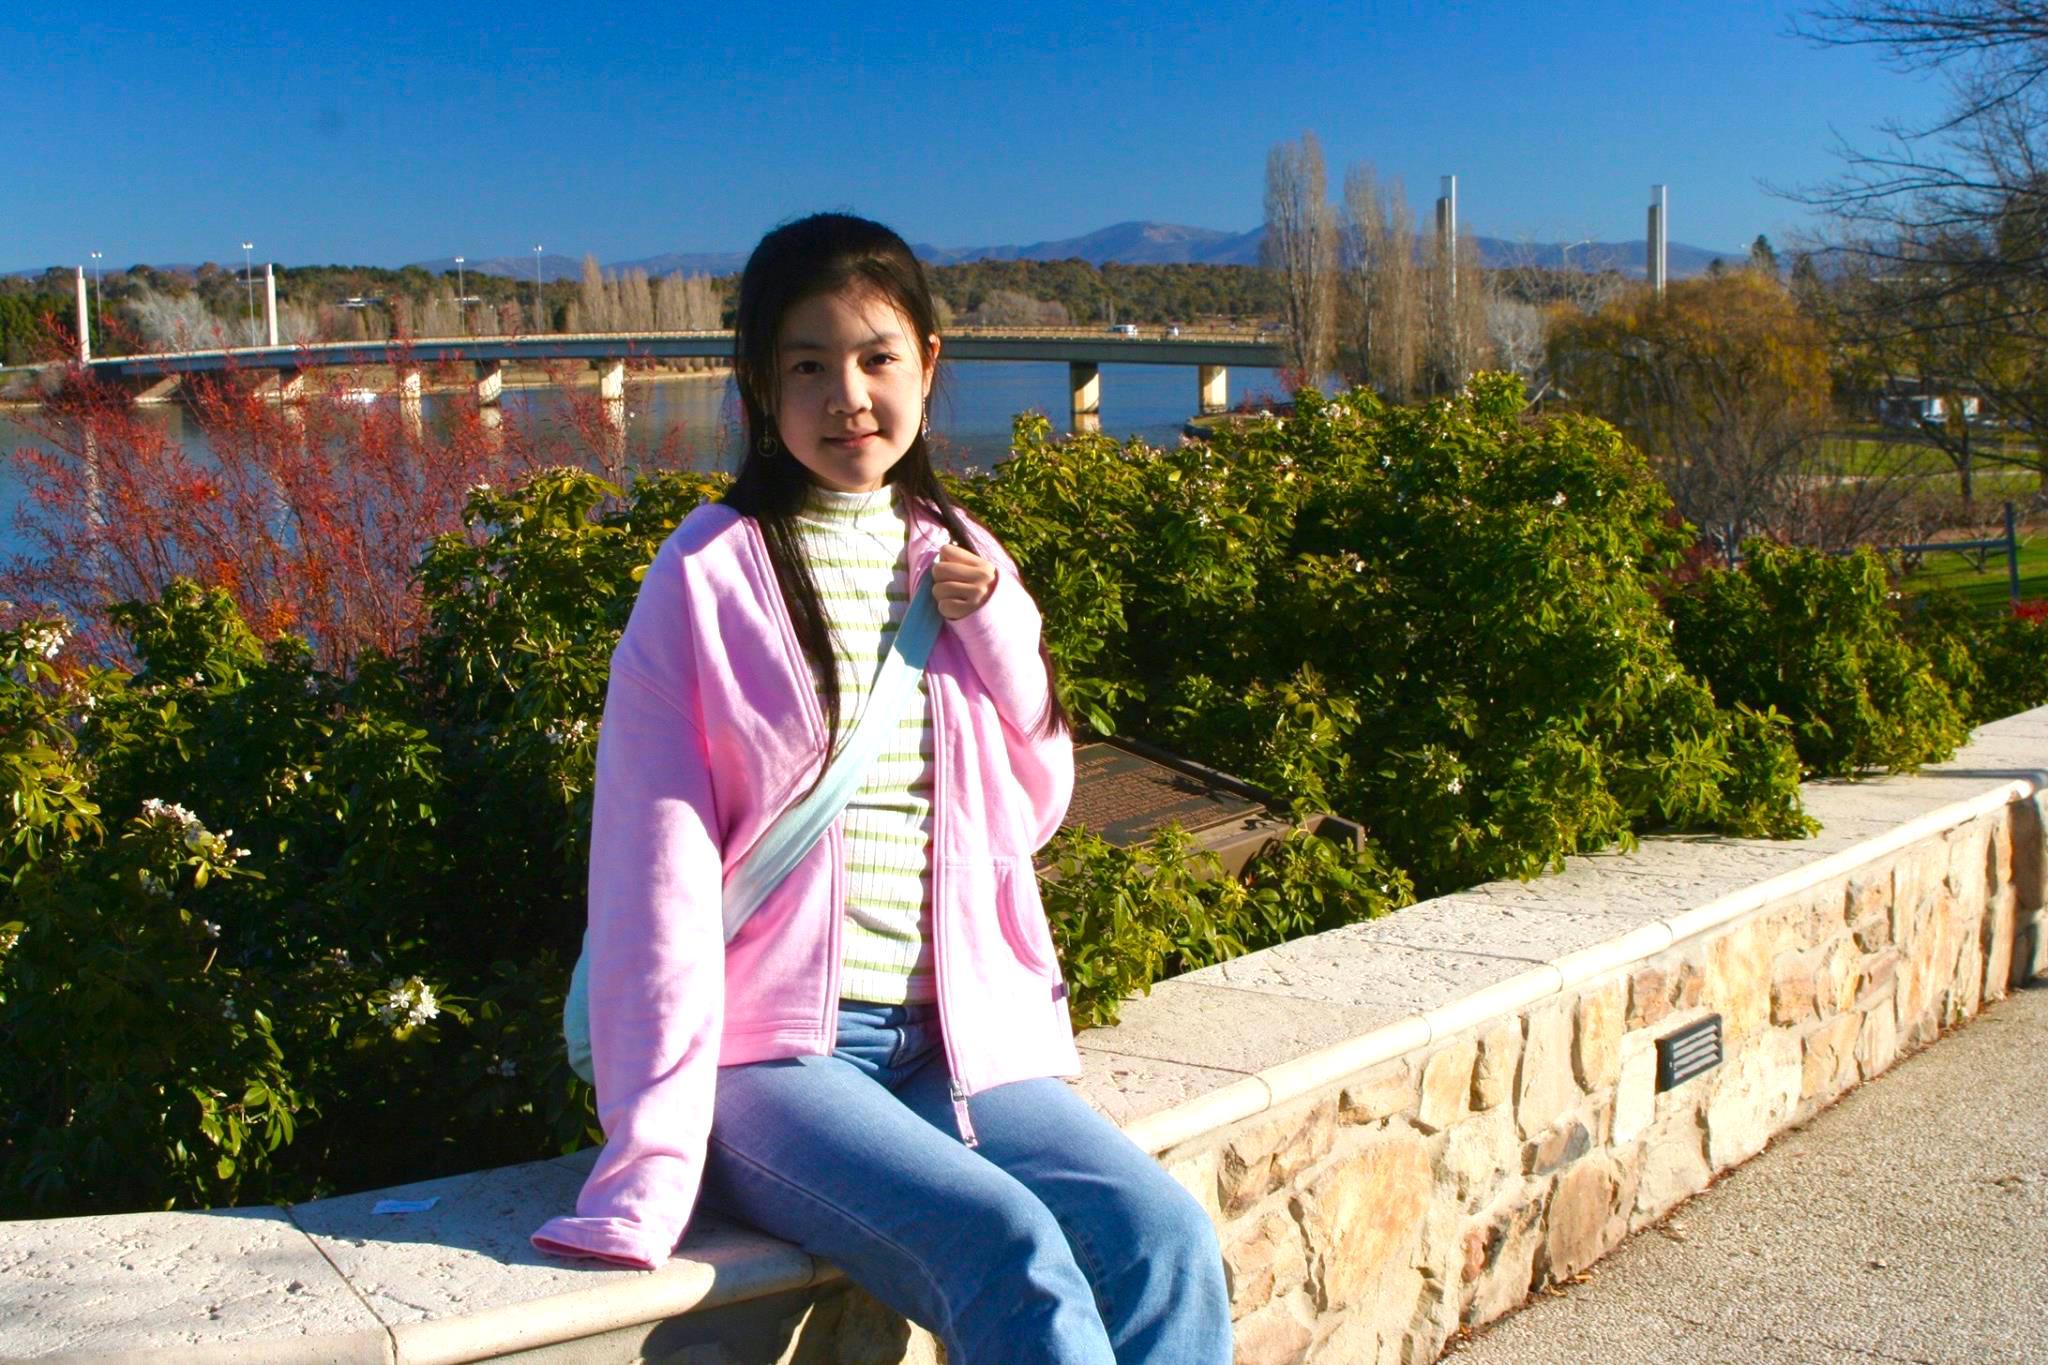 Jennifer Zeng's daughter at Canberra, Australia in 2006. 曾錚的女兒2006年攝於澳大利亞首都堪培拉。